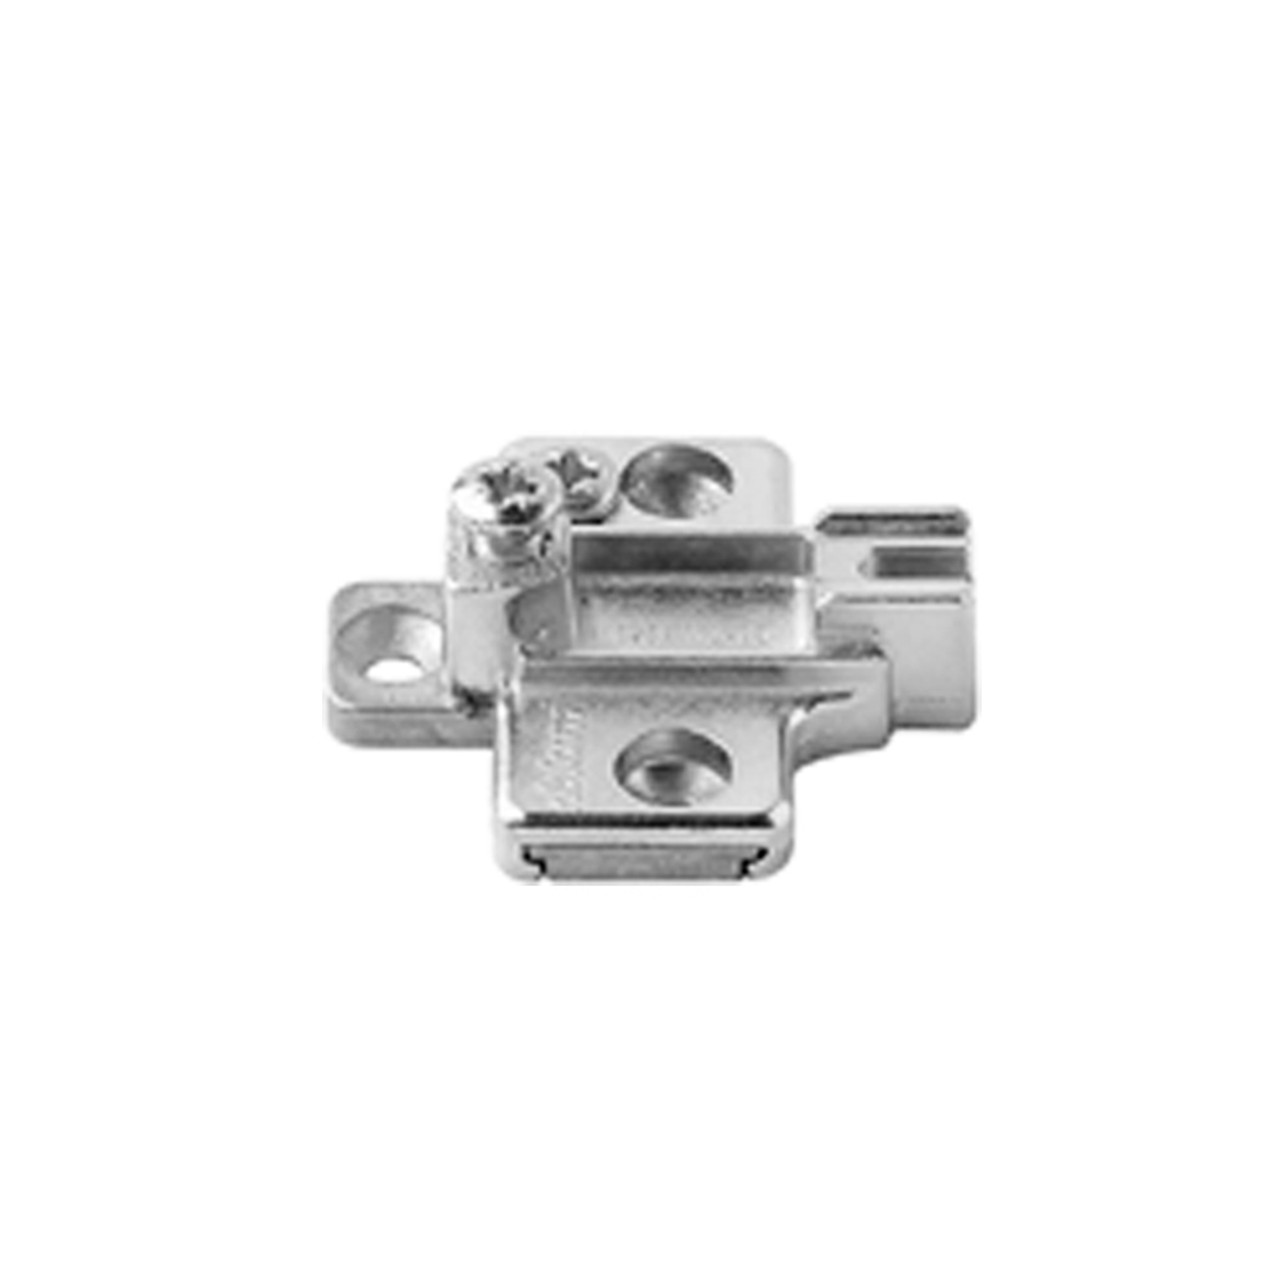 195H7130 MODUL Cruciform Mounting Plate | 3mm